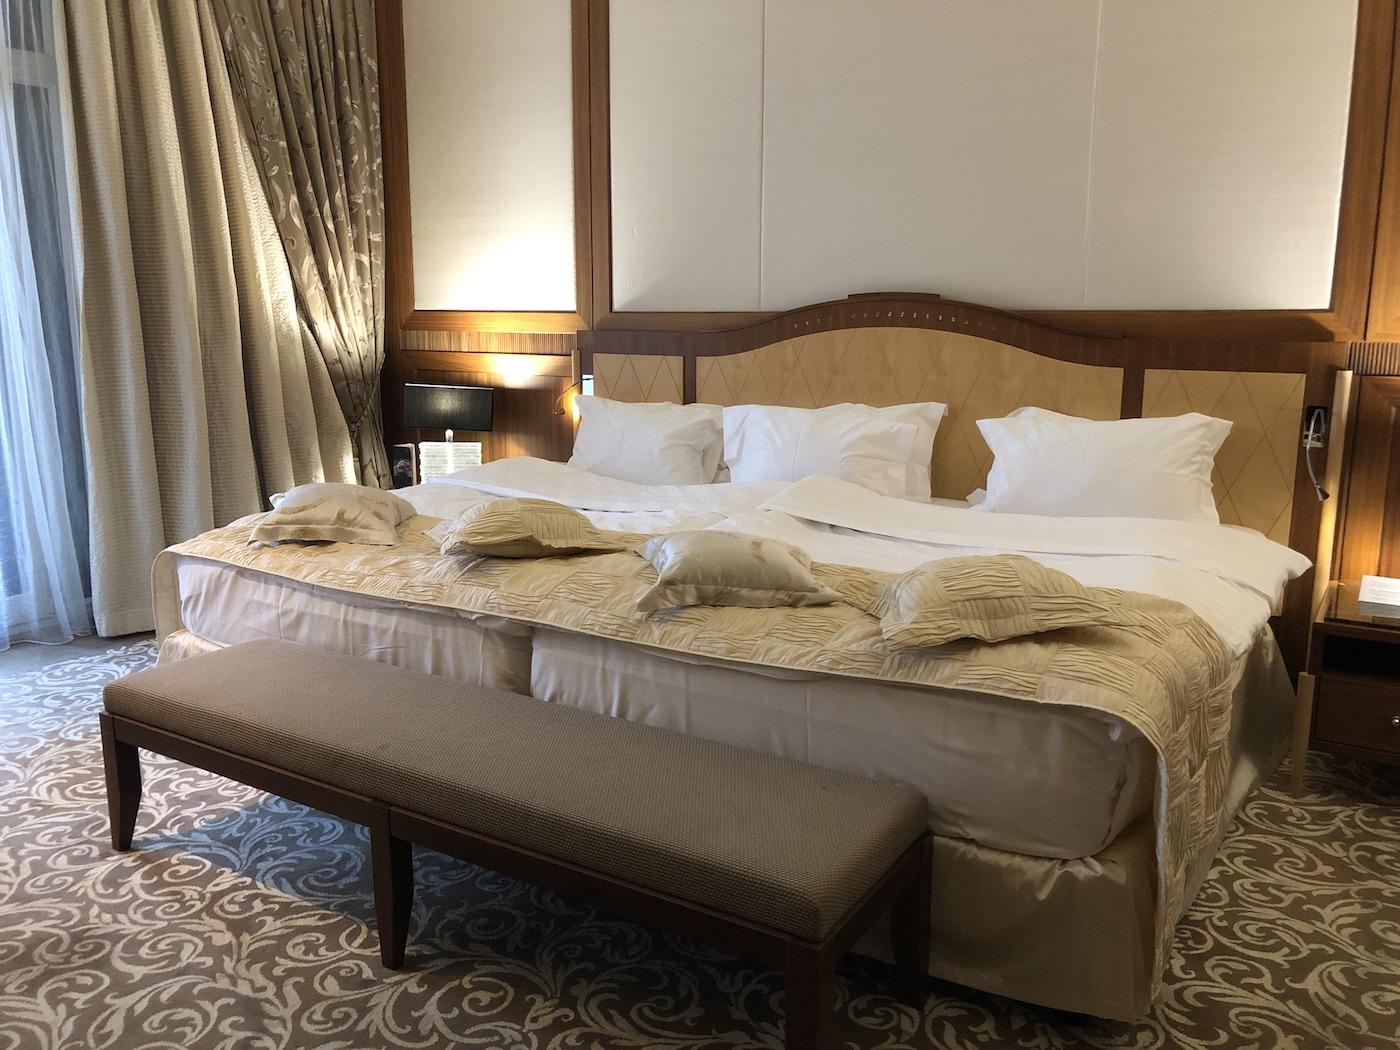 Una suite dell'hotel Kempinski Palace Portorož